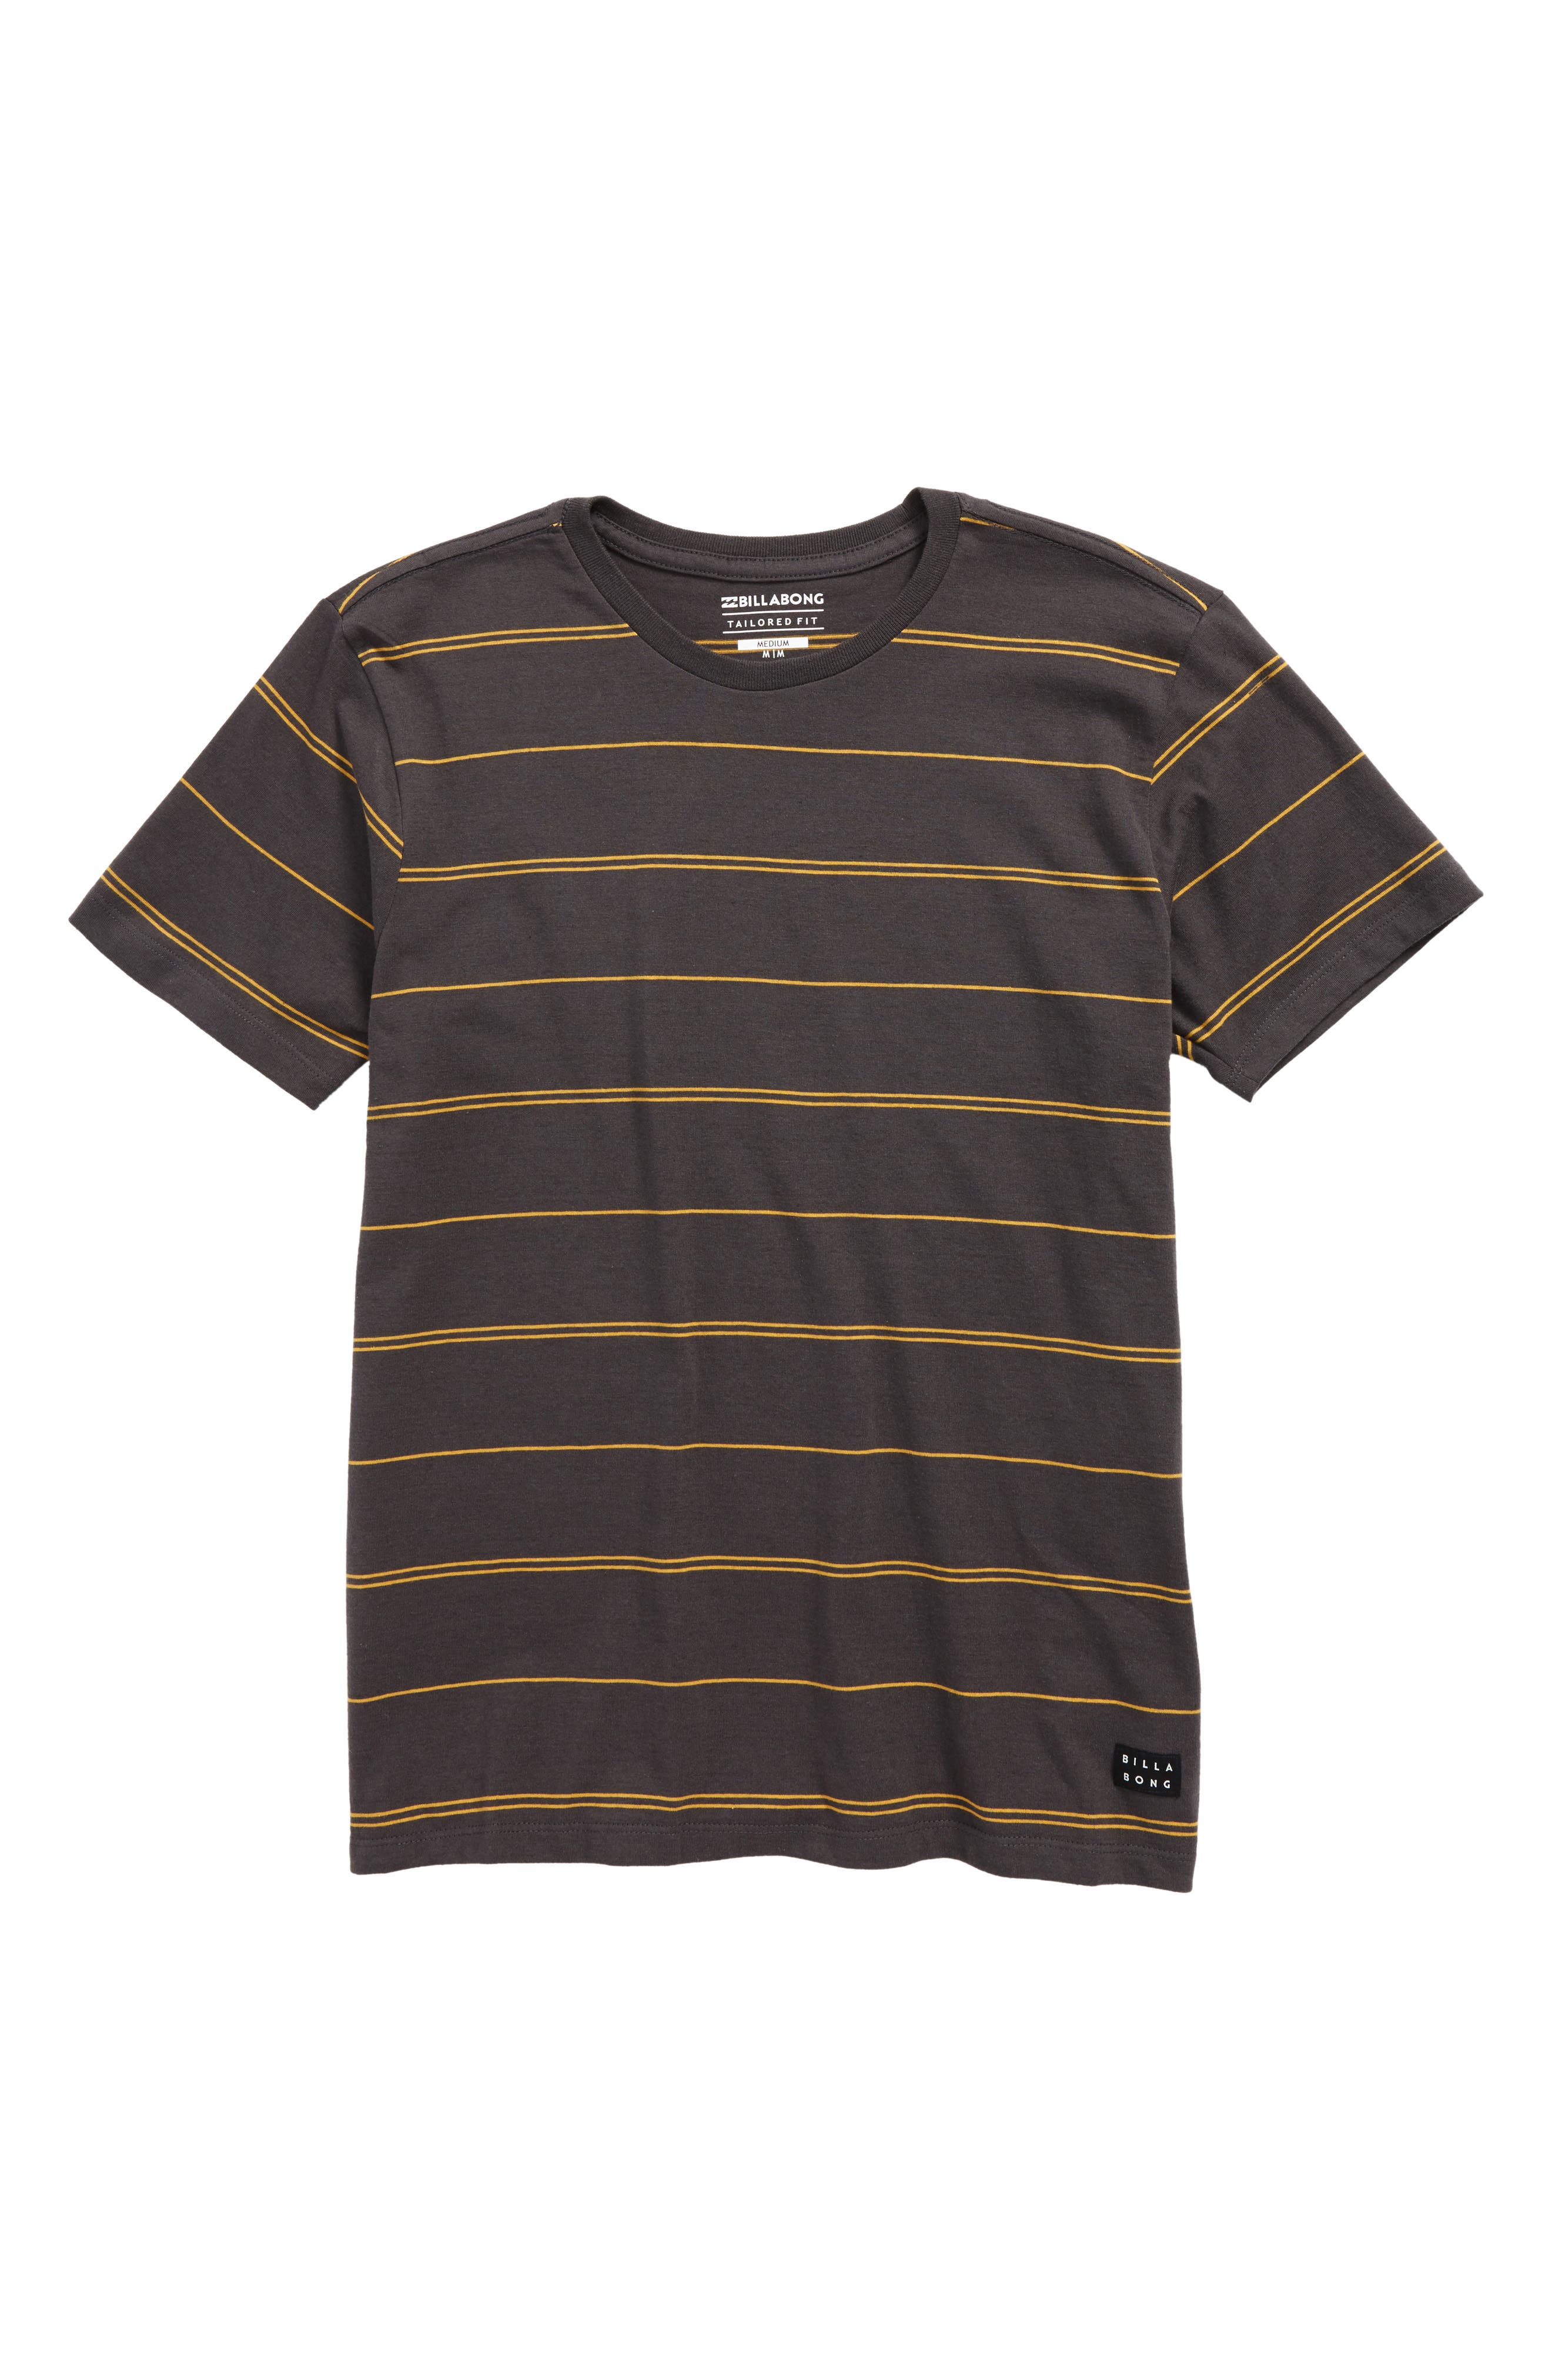 Alternate Image 1 Selected - Billabong Die Cut Stripe Ringer T-Shirt (Big Boys)